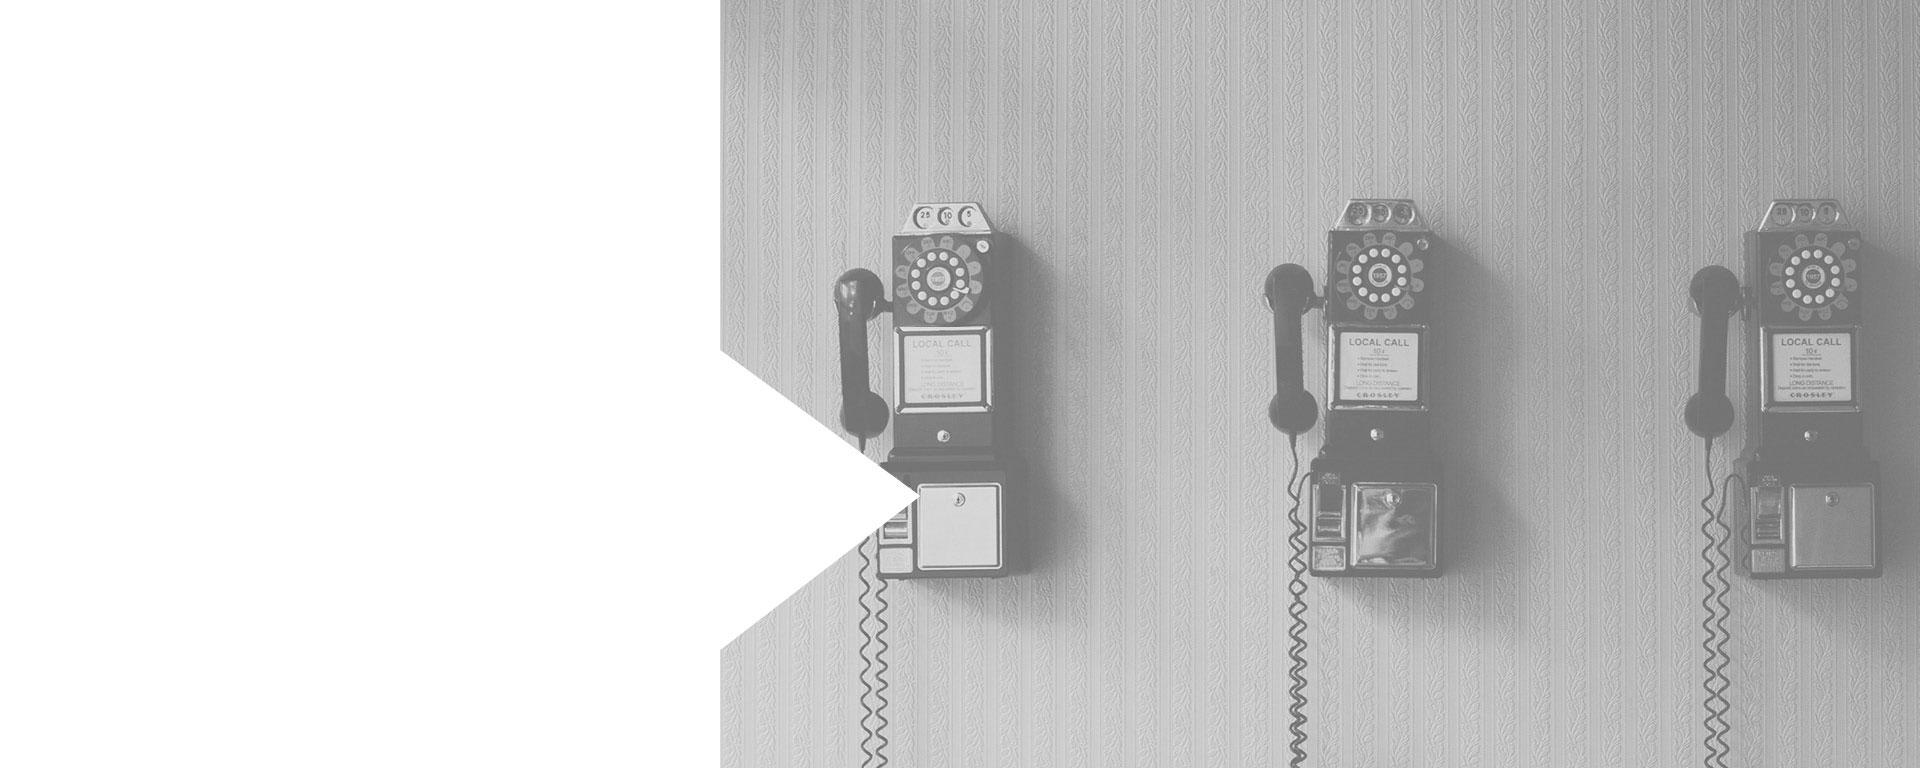 Telefon Mail Anrufen Kontakt